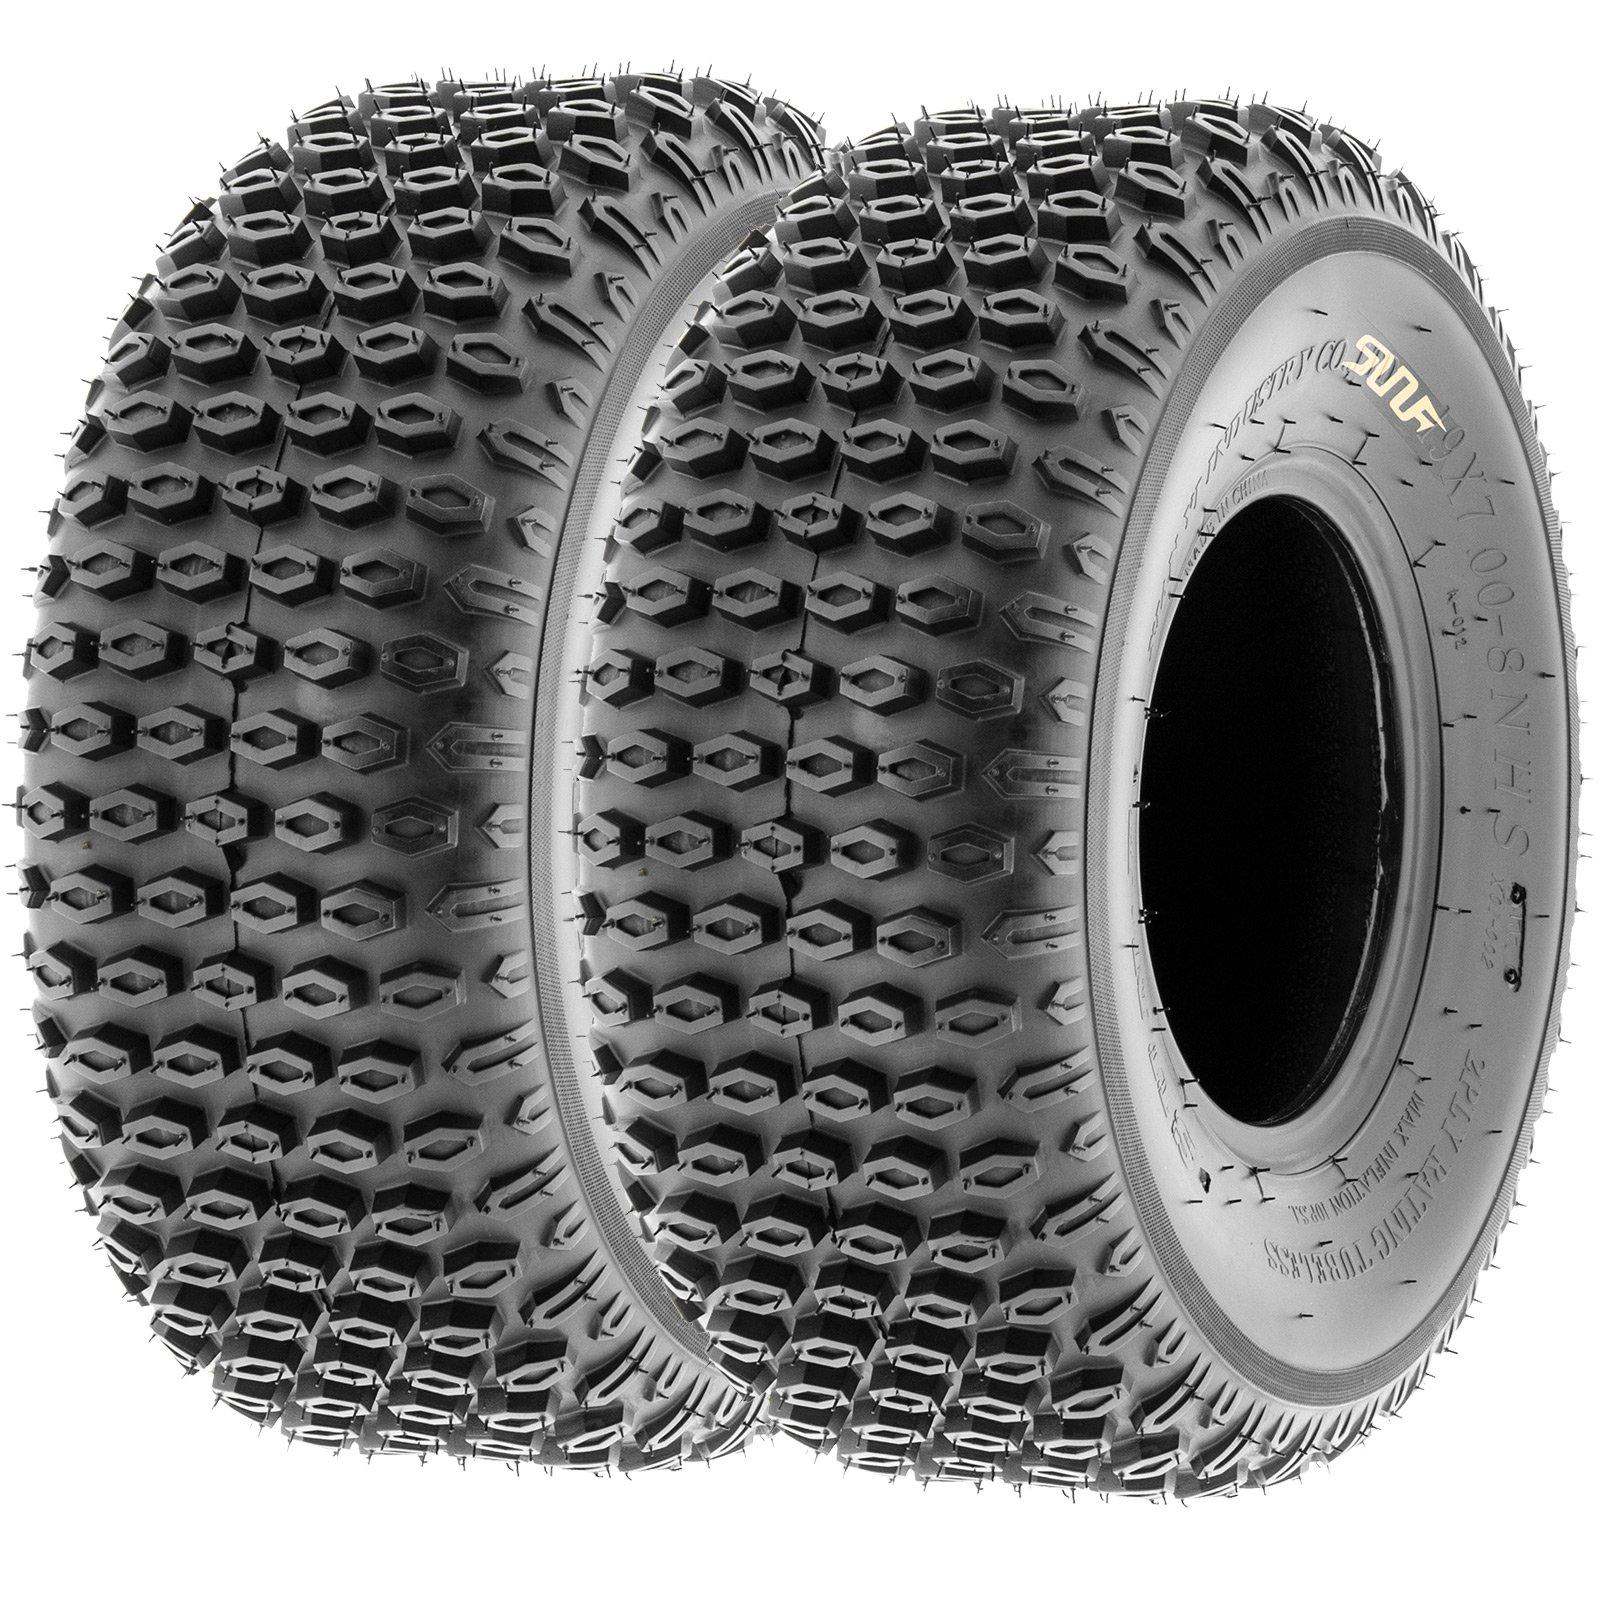 SunF Quad ATV Sport Tires 16x8-7 16x8x7 4 PR A012 (Full set of 4) by SunF (Image #3)